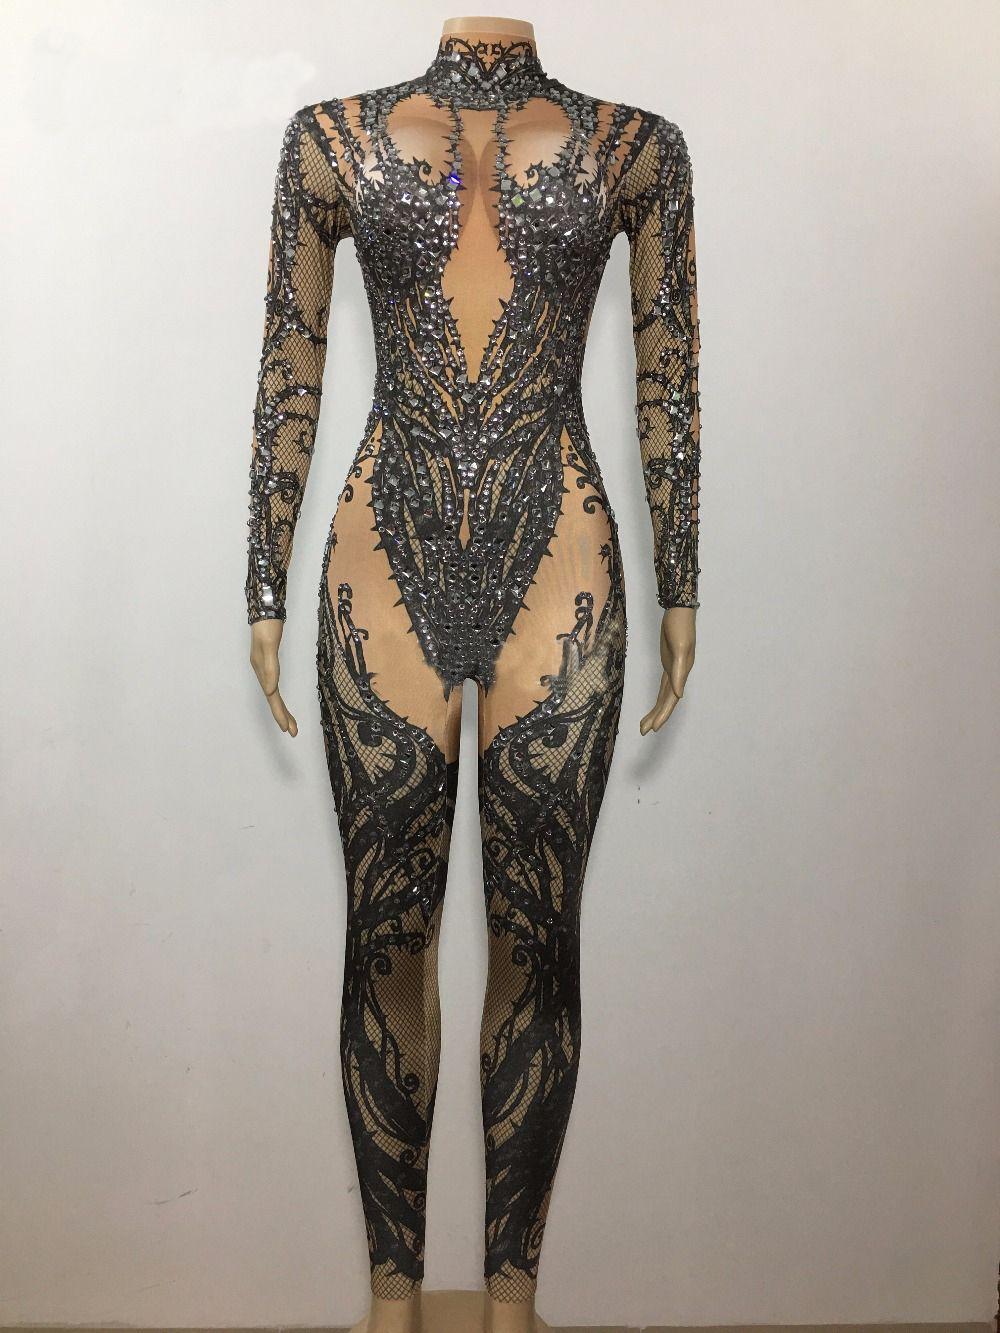 DJ Songbird Sexy Black Nude Strass Jumpsuit Sexy Nachtclub Bar Tragen Stones Bodysuit Leggings Prom Feiern Outfit Performance Dress